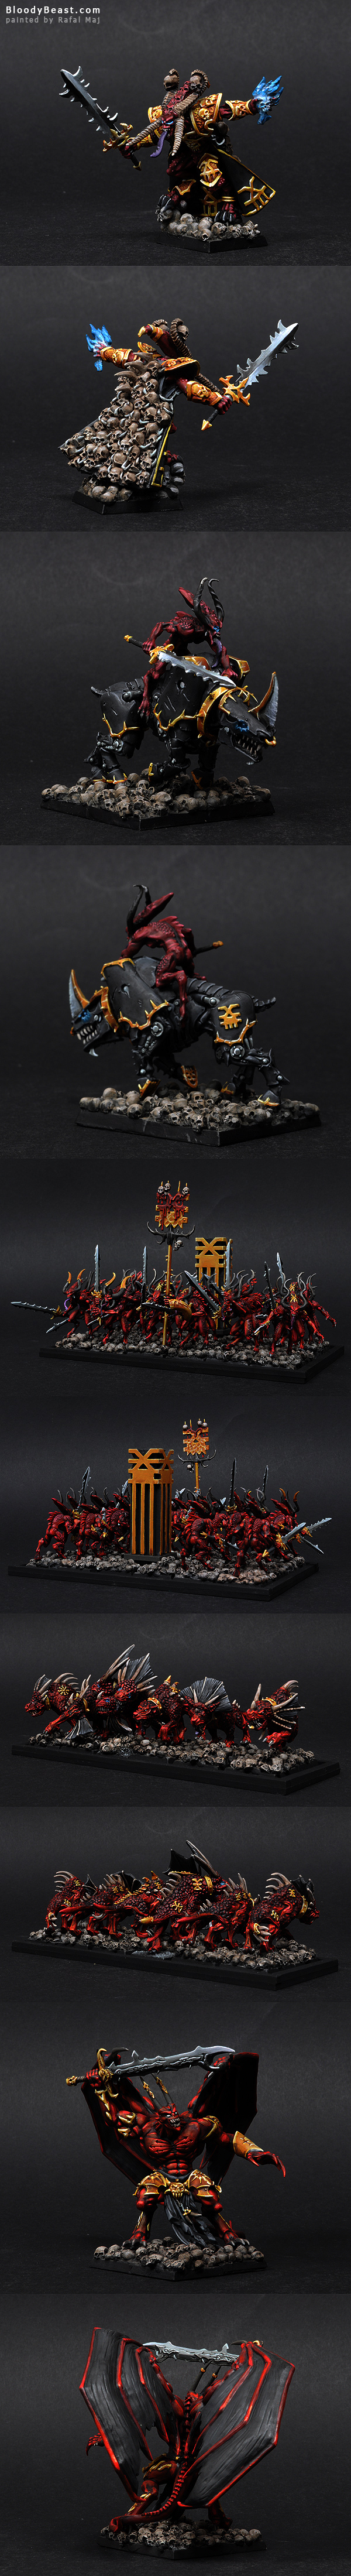 Khorne Daemon Army painted by Rafal Maj (BloodyBeast.com)